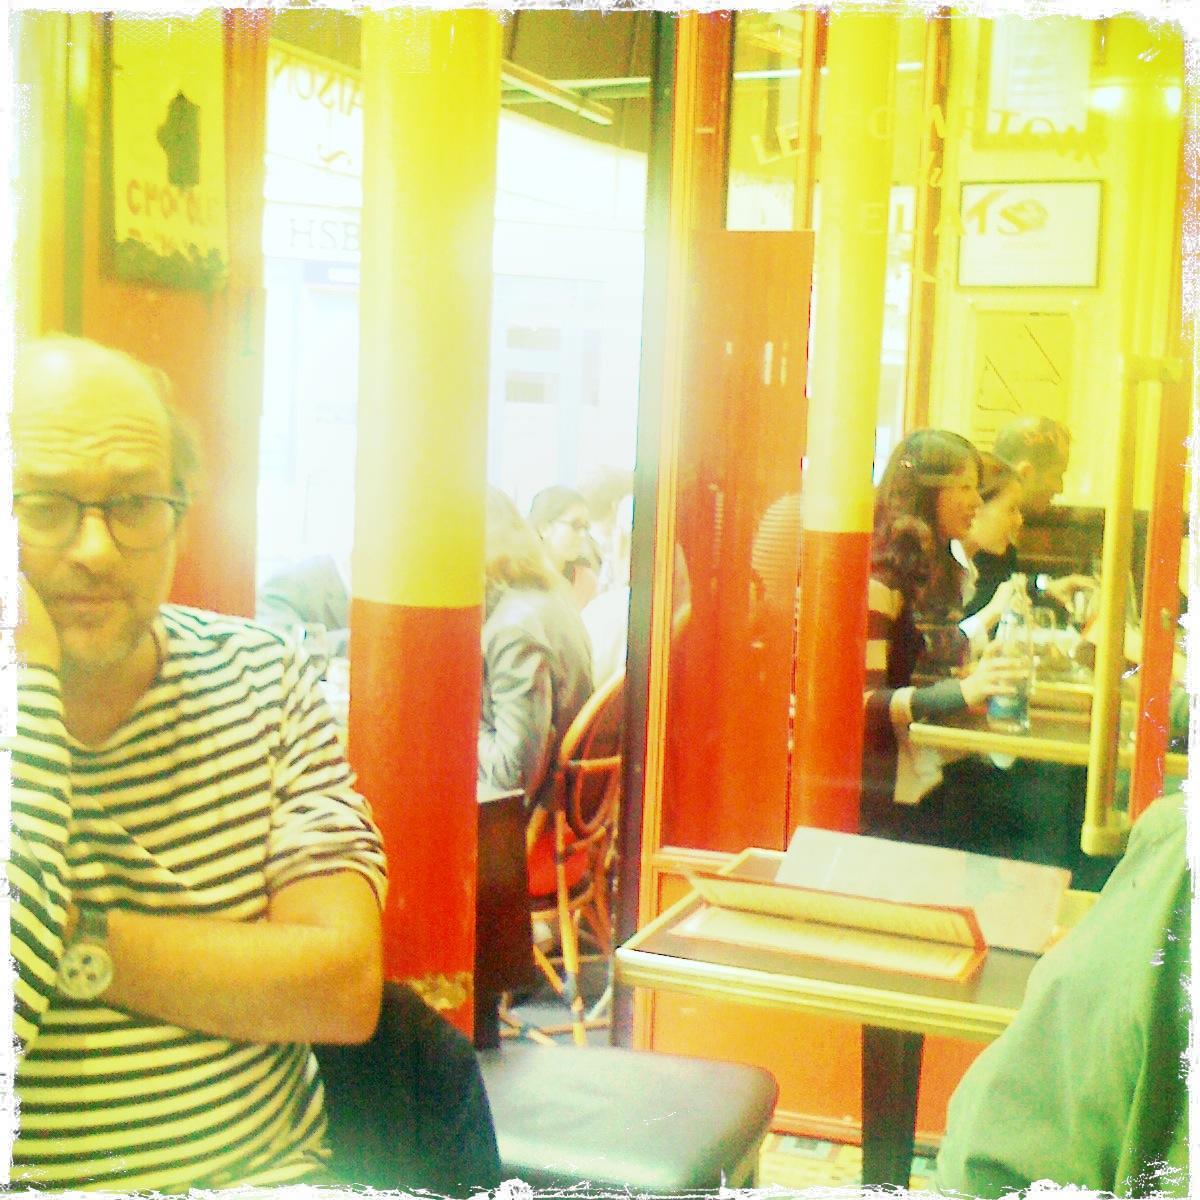 Paris honeymoon itinerary - Le comptoir du relais restaurant reservations ...